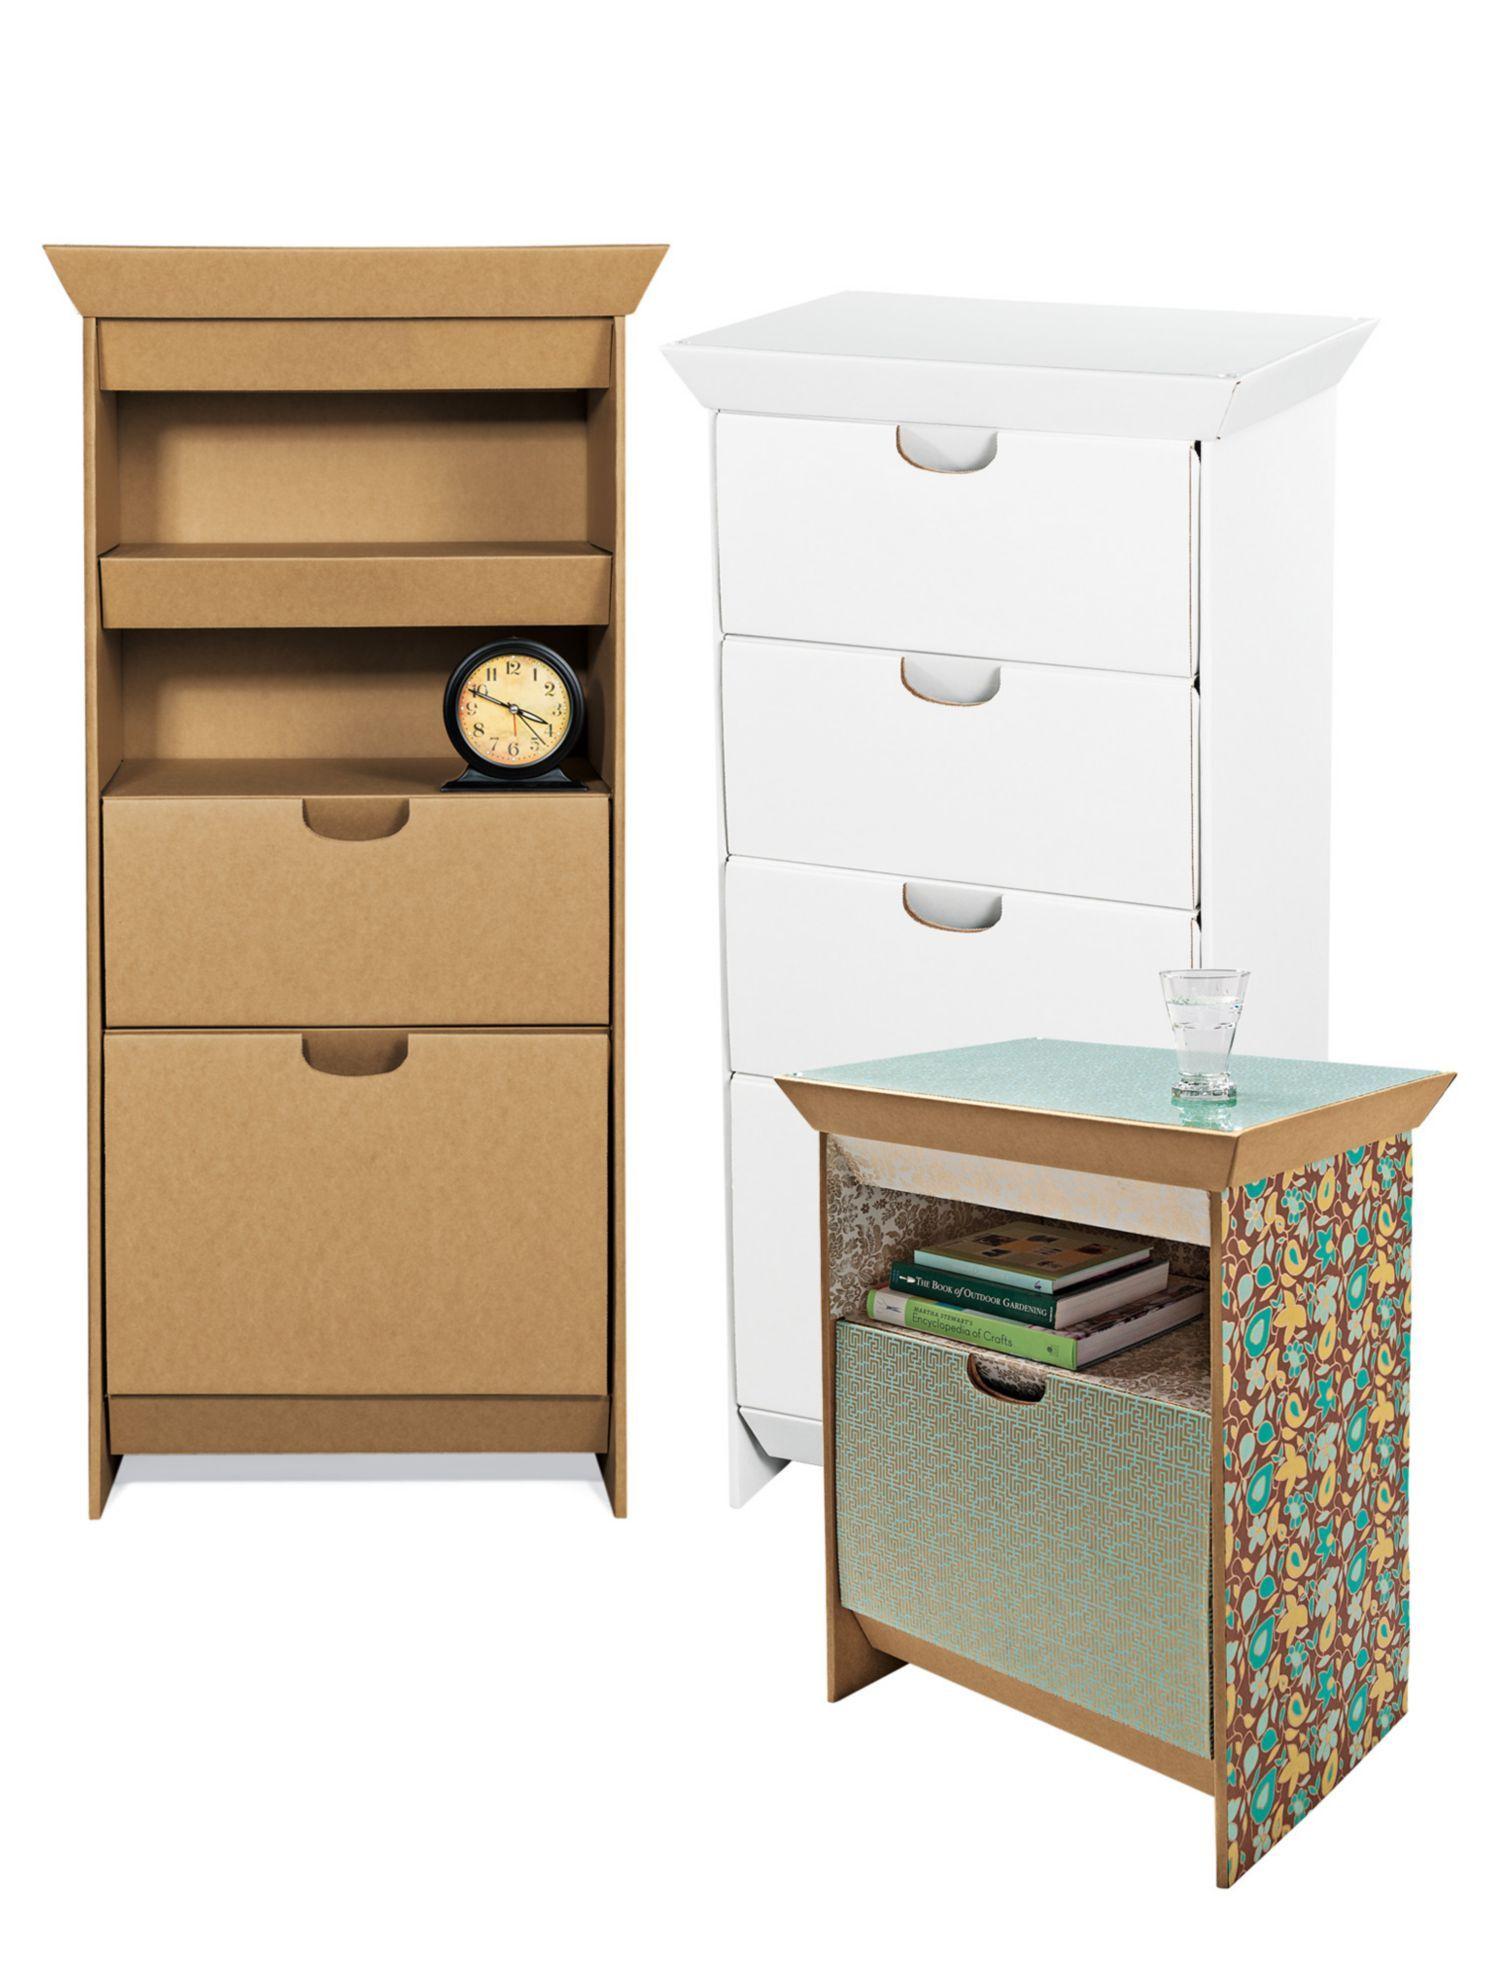 Uncategorized Design Your Own Dresser design your own dresser or night stand cardboard furniture smartdeco solutions